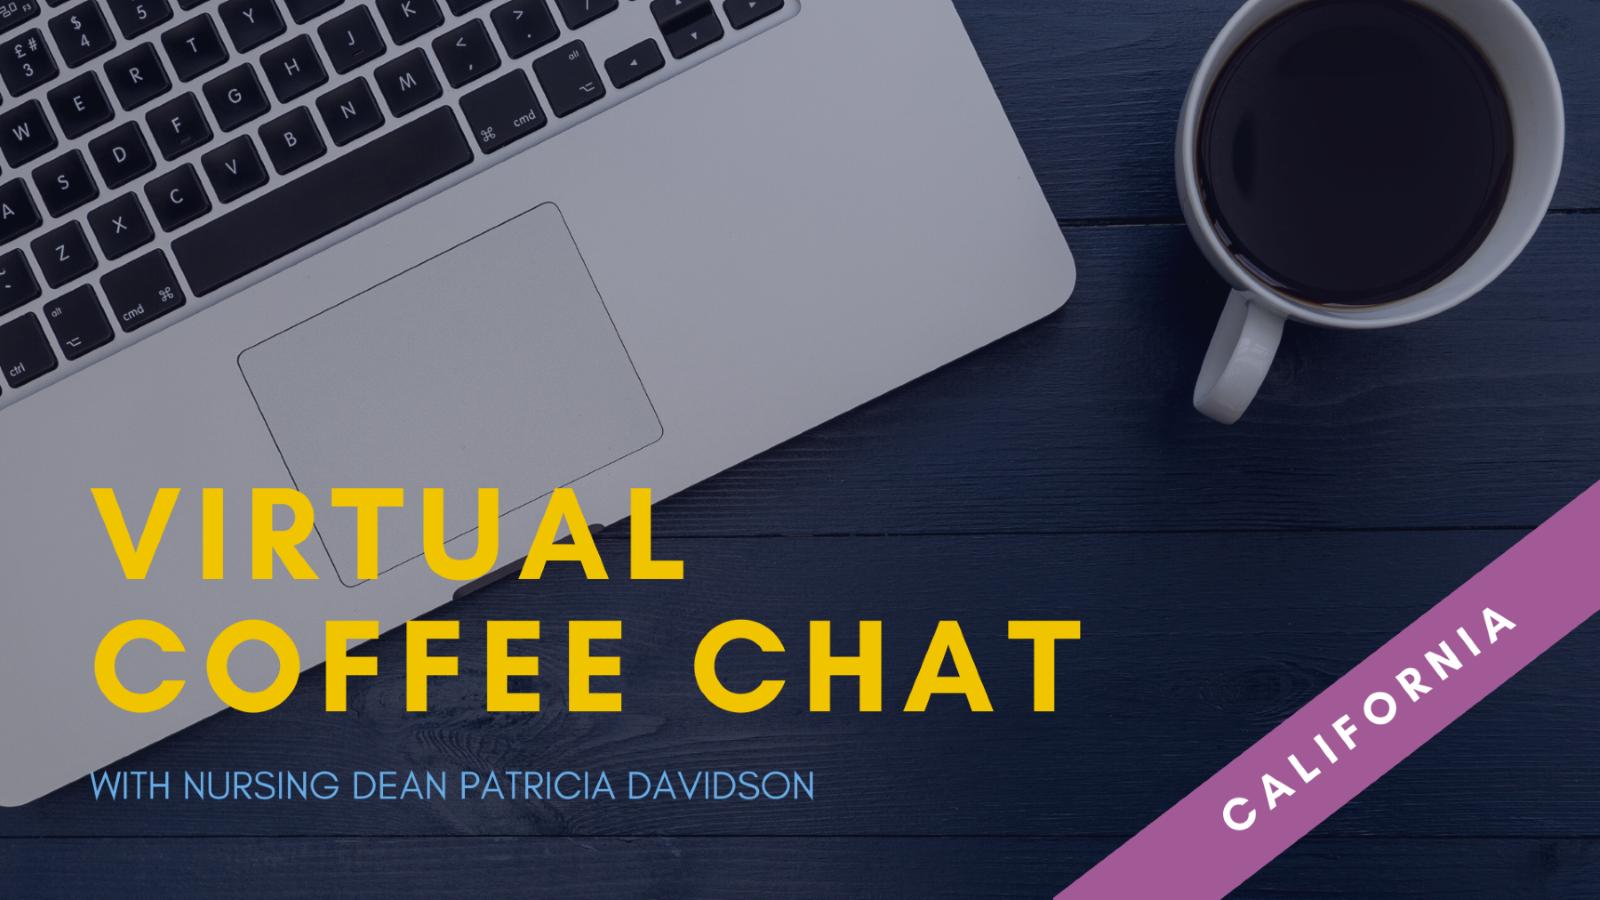 Virtual Coffee Chat with Nursing Dean Davidson - California header image